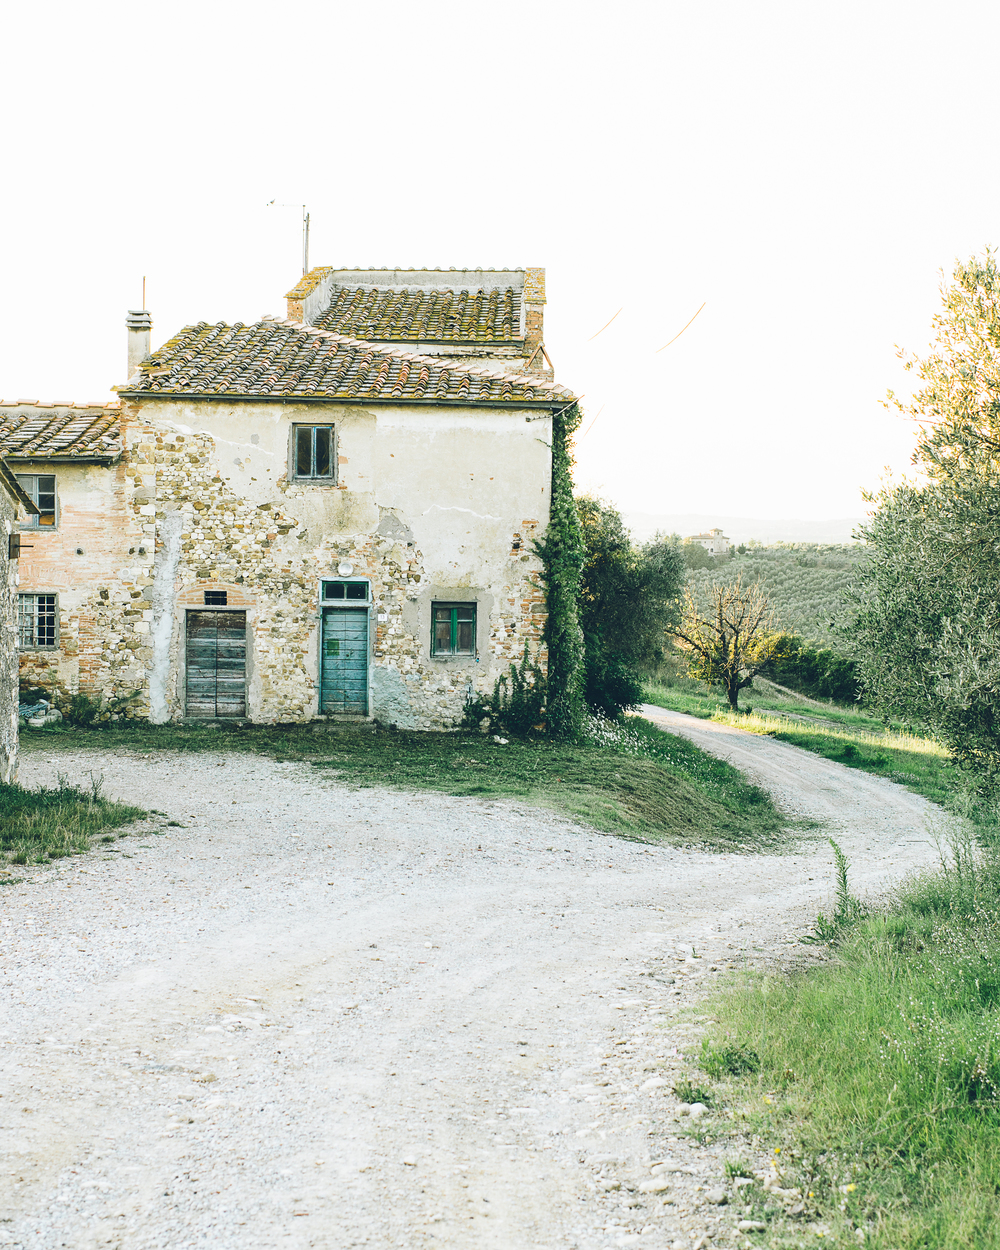 20140816-Tuscany241.jpg